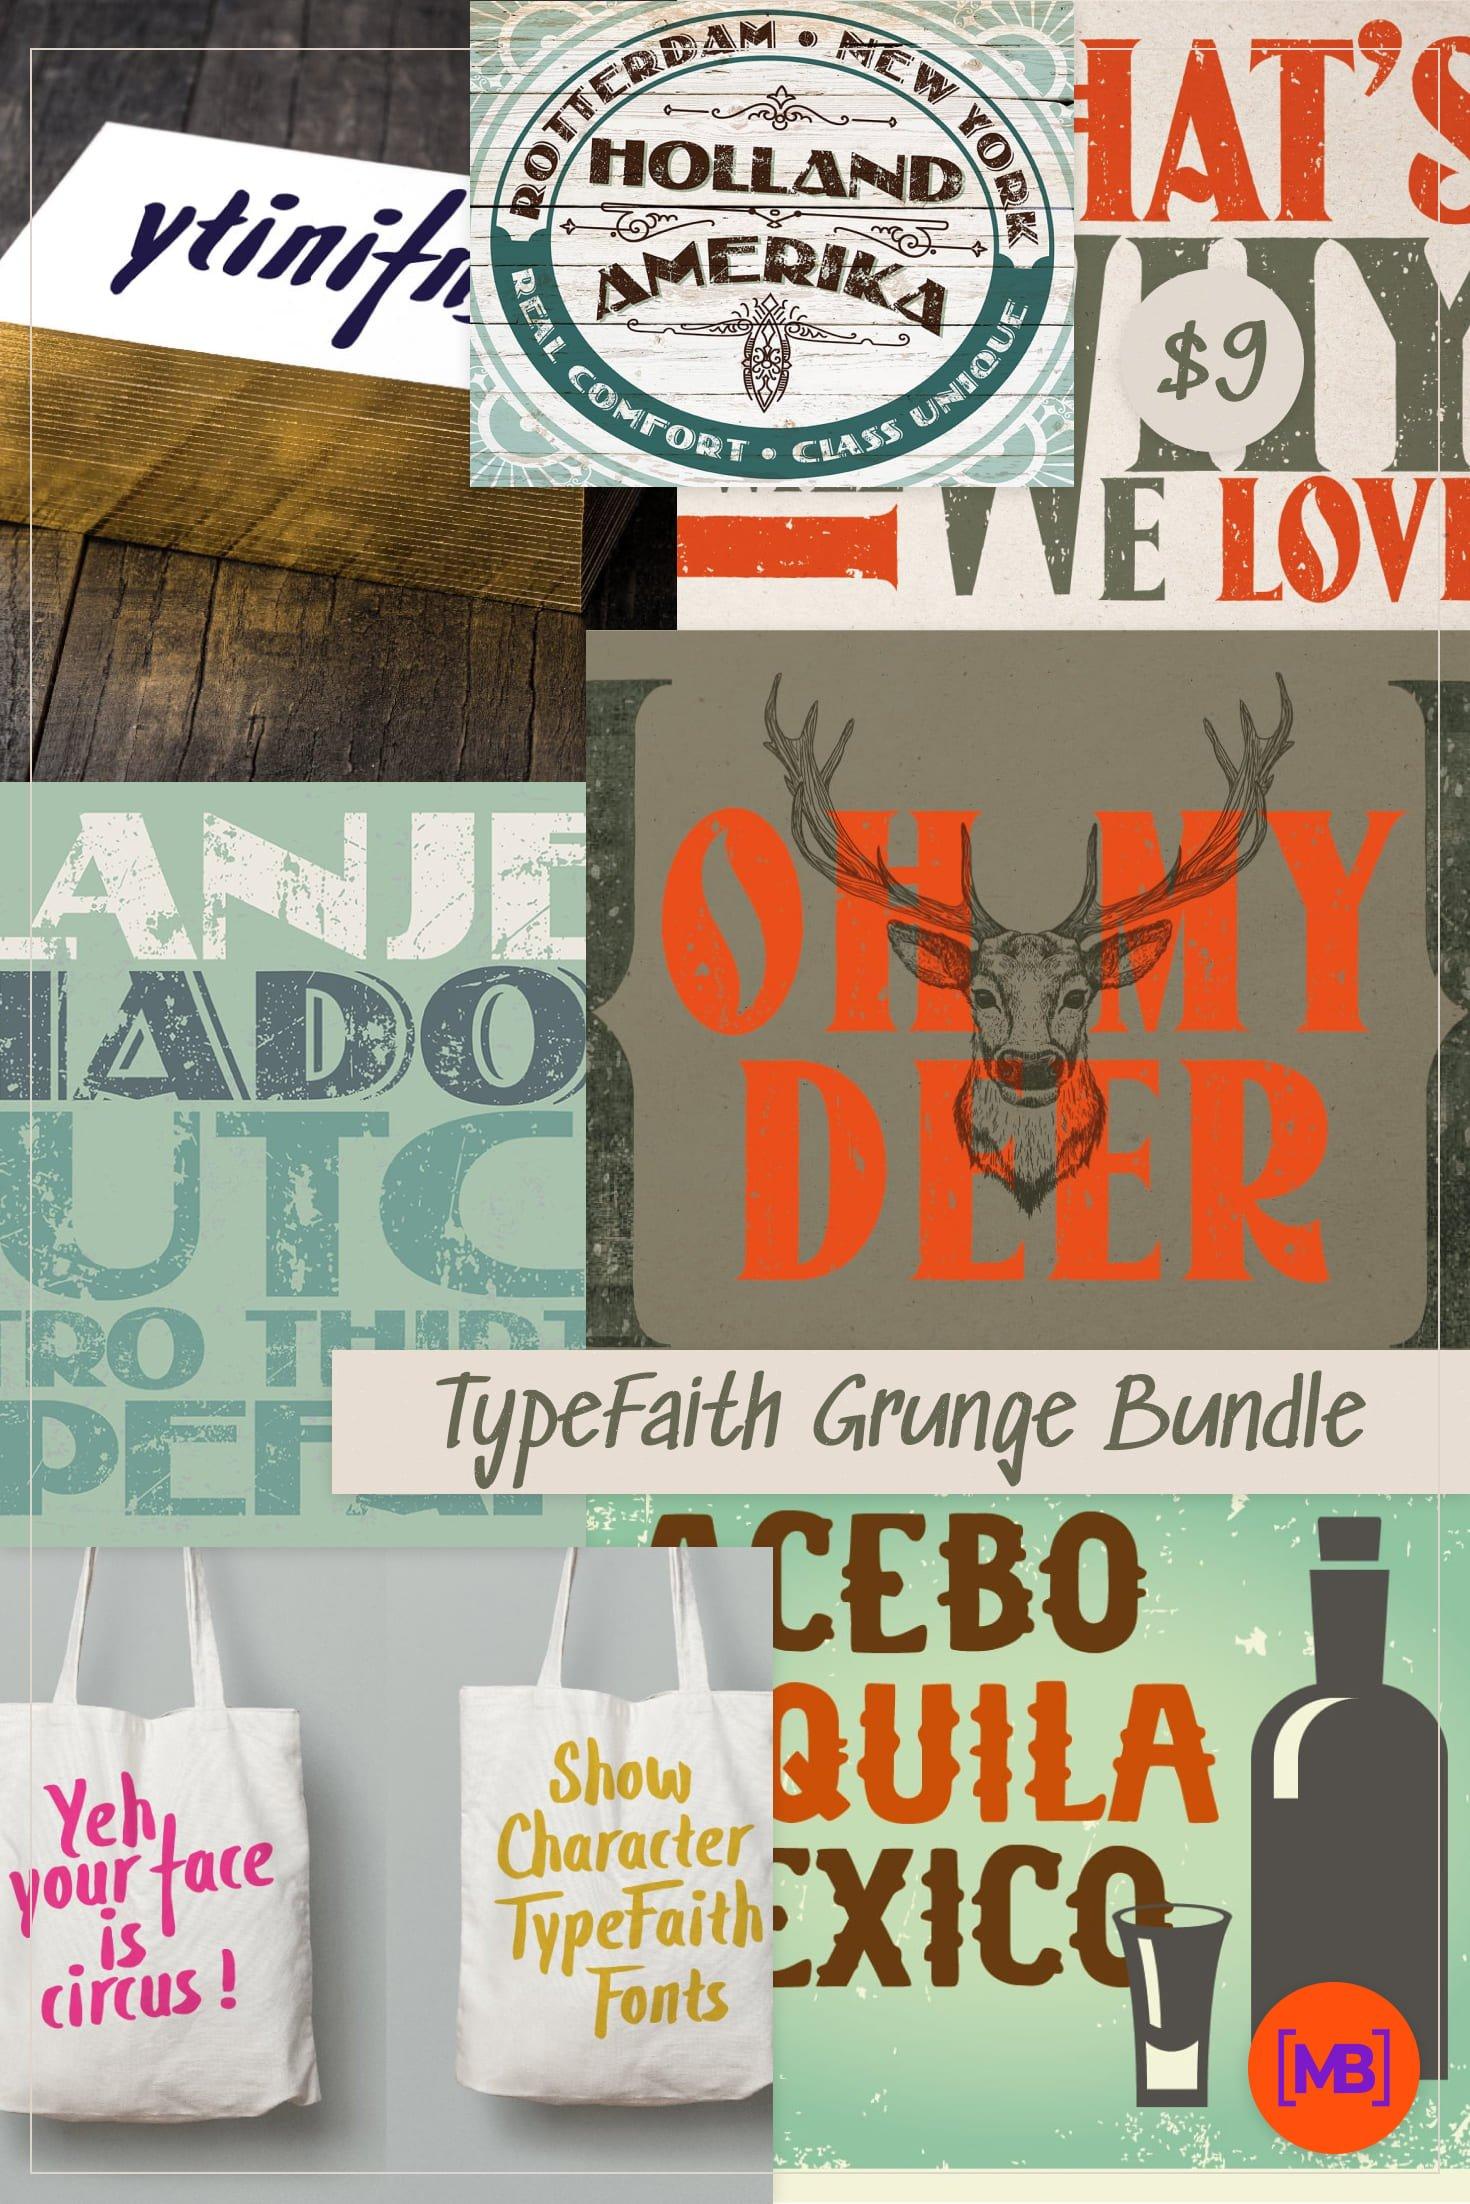 TypeFaith Grunge Bundle: 18 Grunge Script Fonts - just $9. Collage Image.